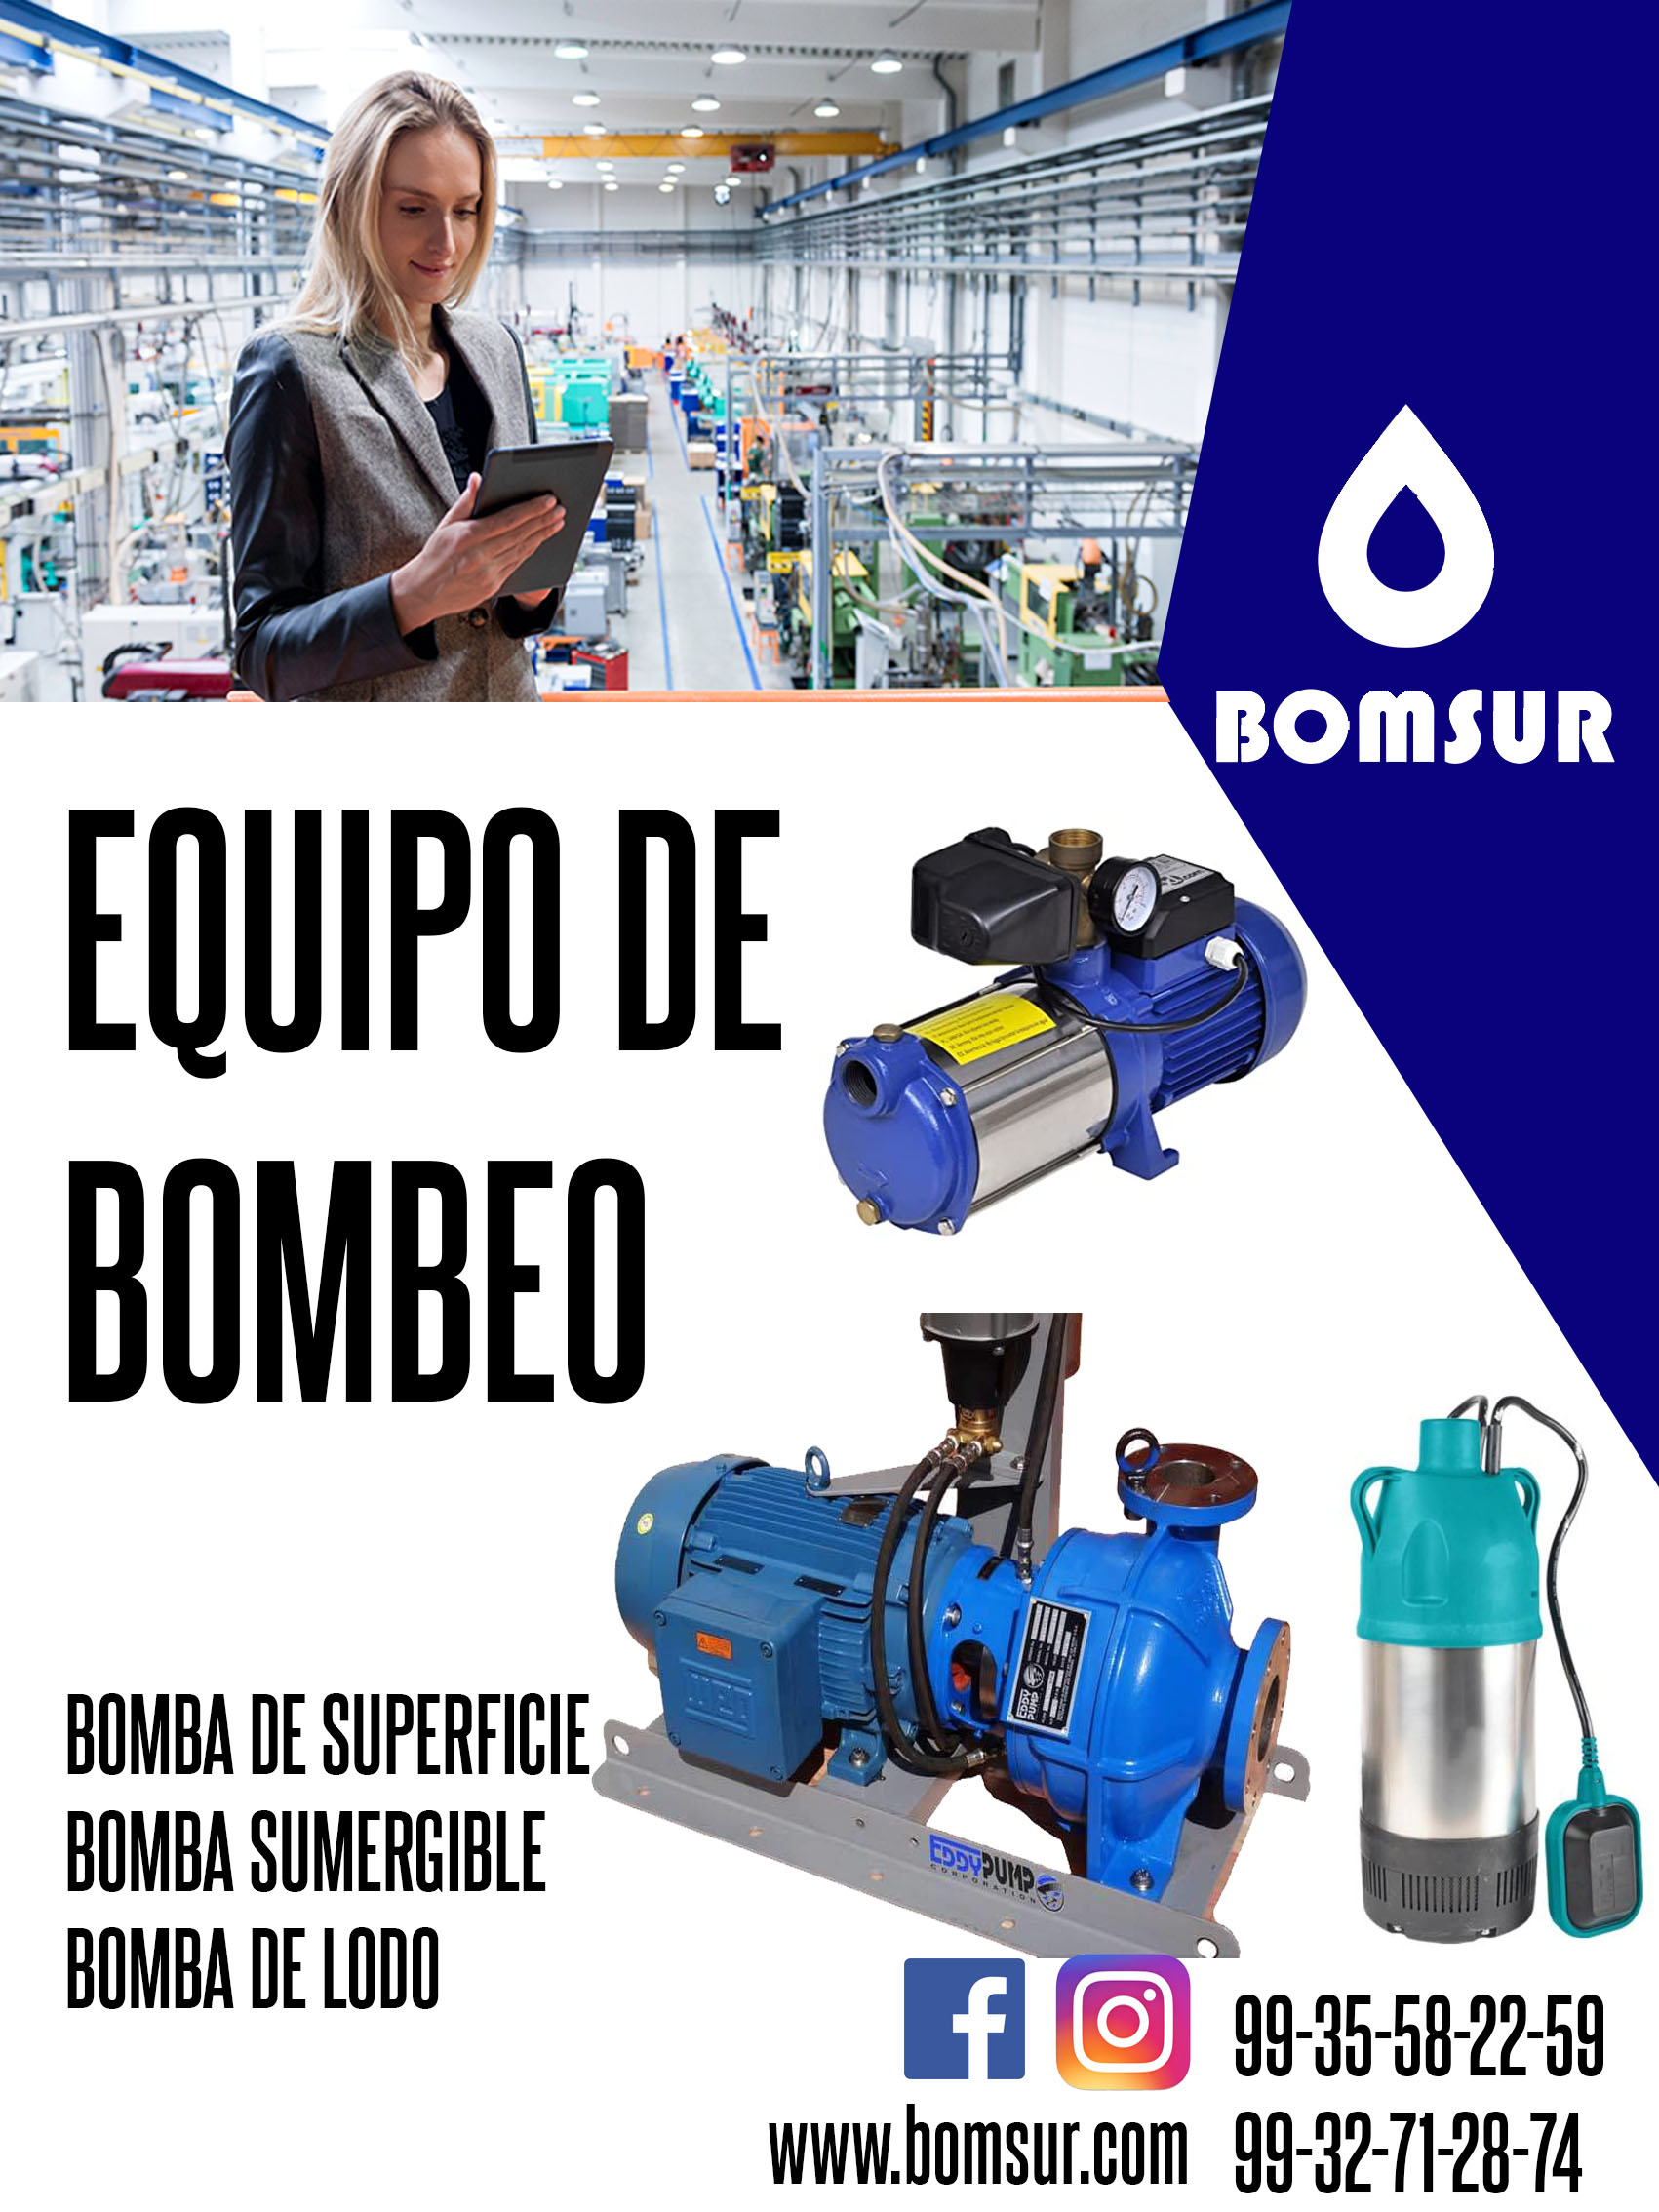 EQUPO DE BOMBEO